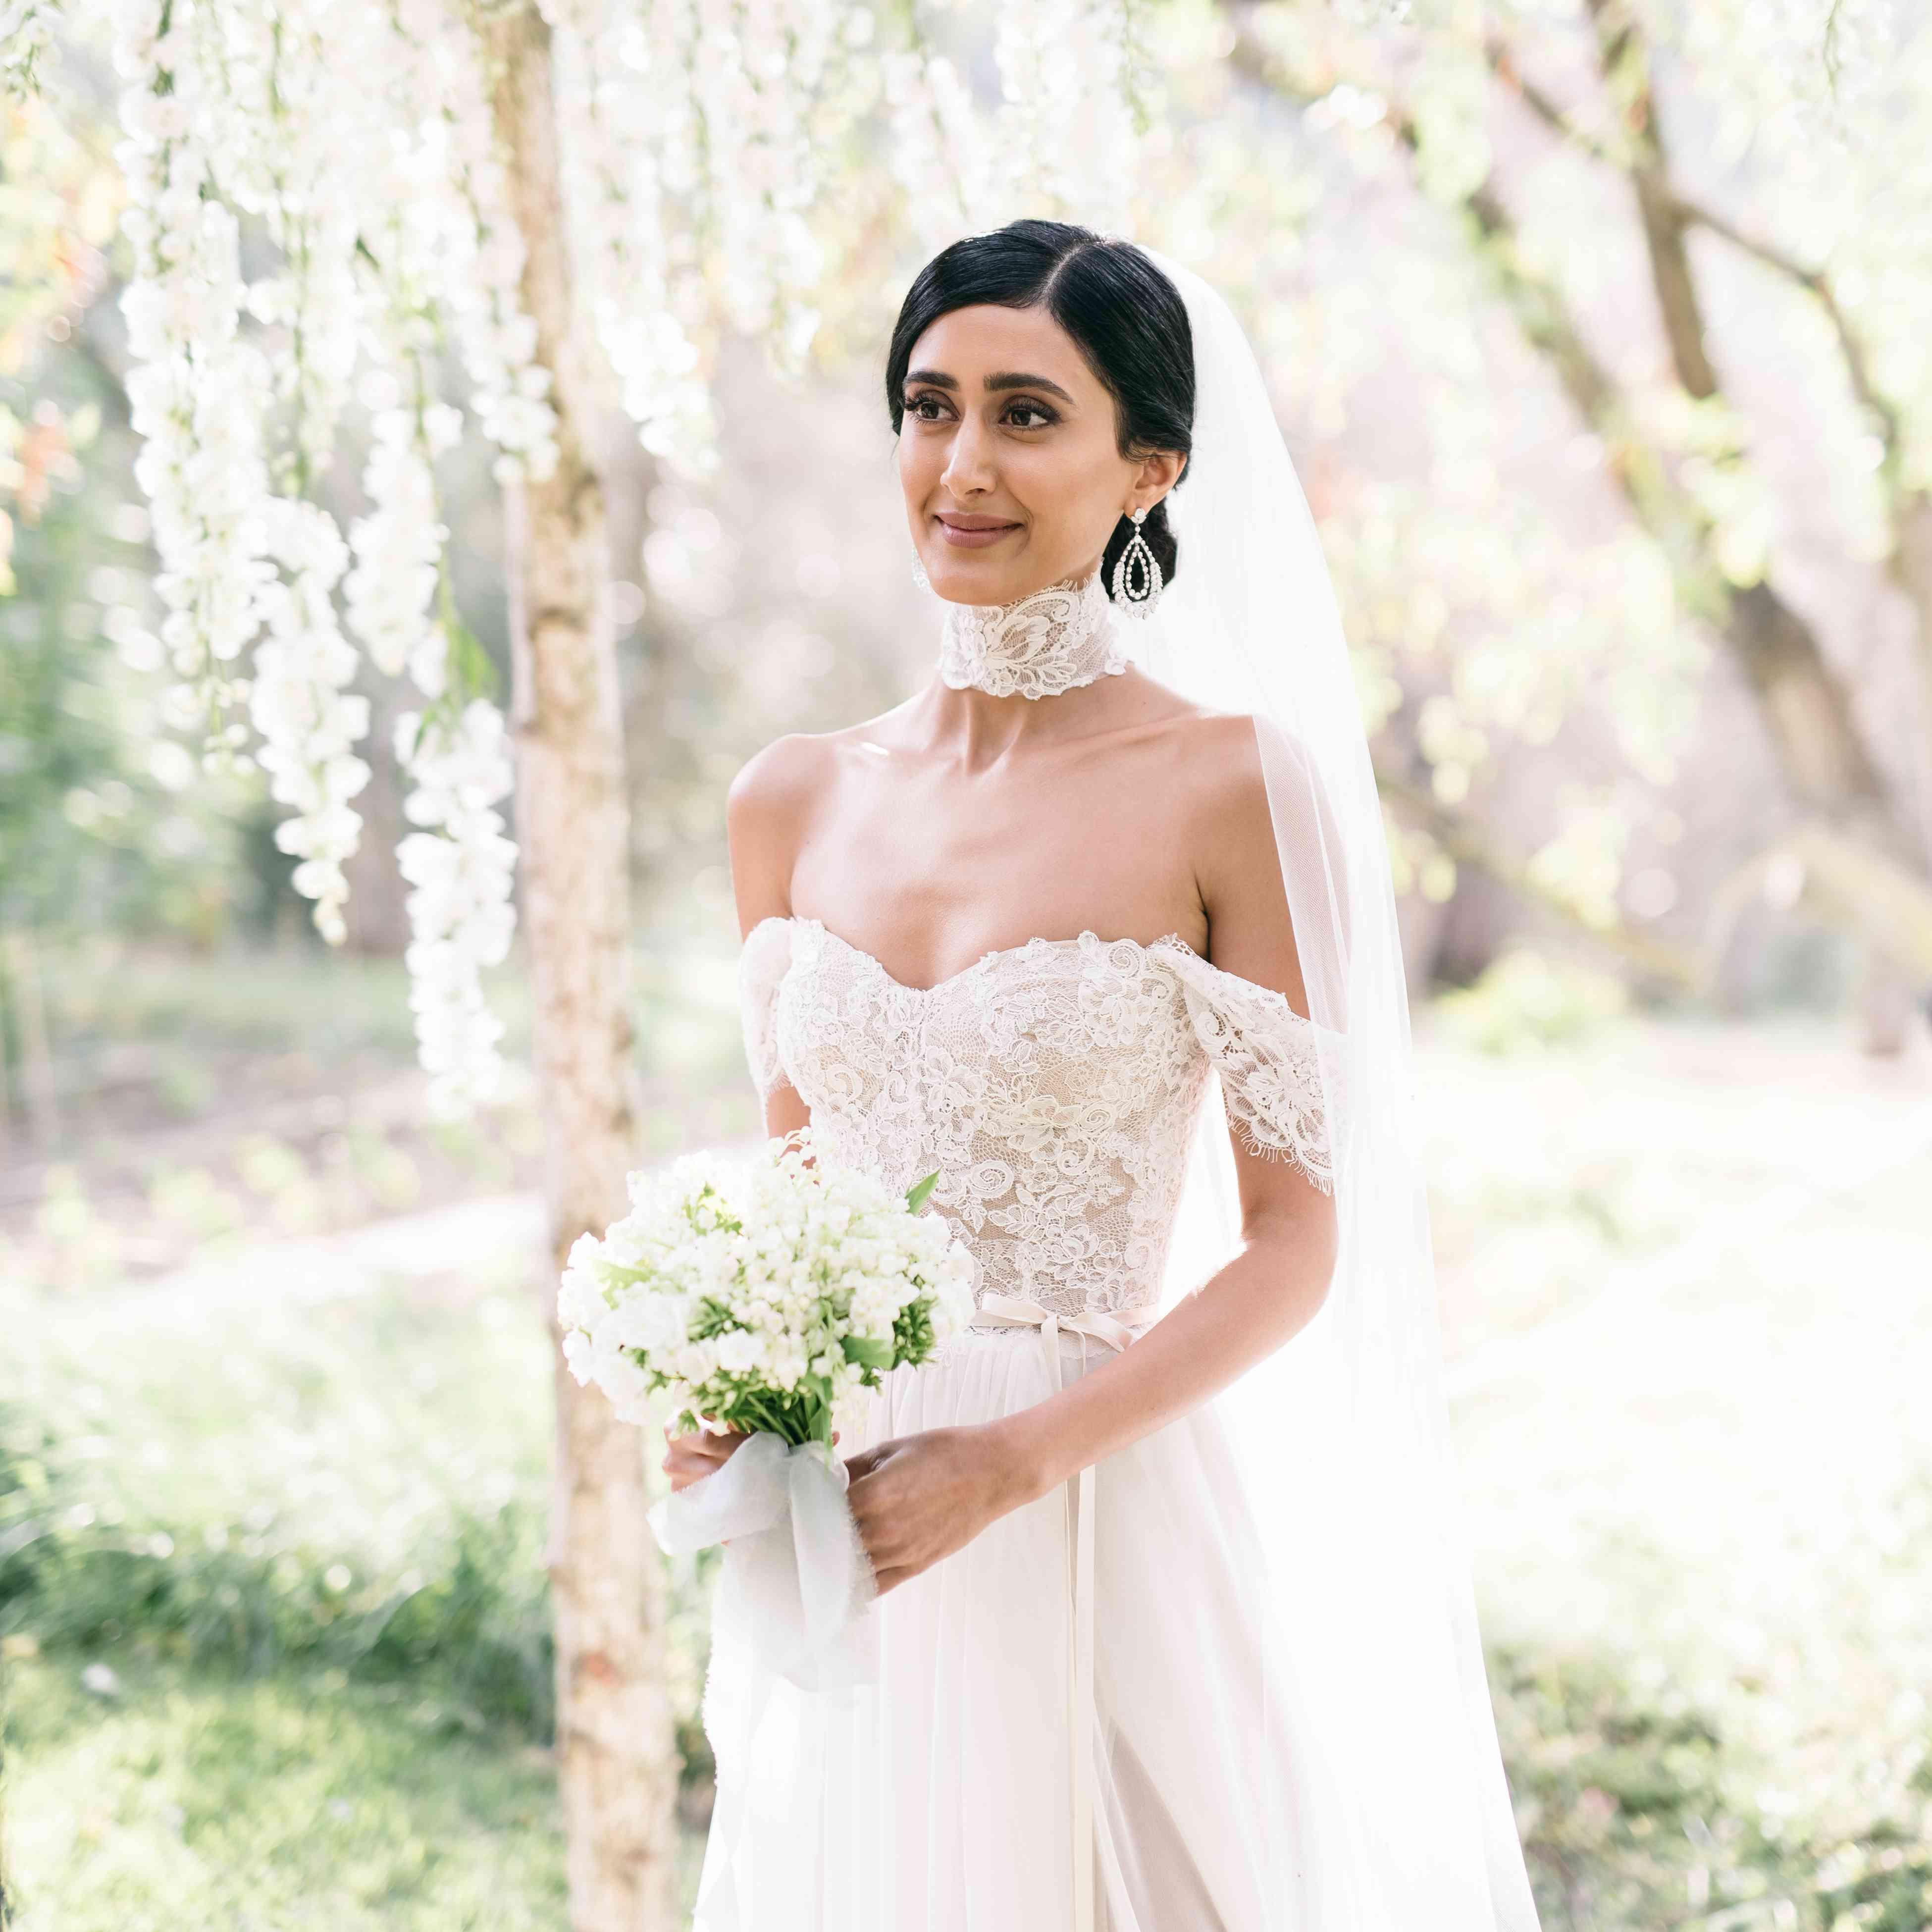 The 35 Best Wedding Dresses Of 2019,Neon Wedding Dresses